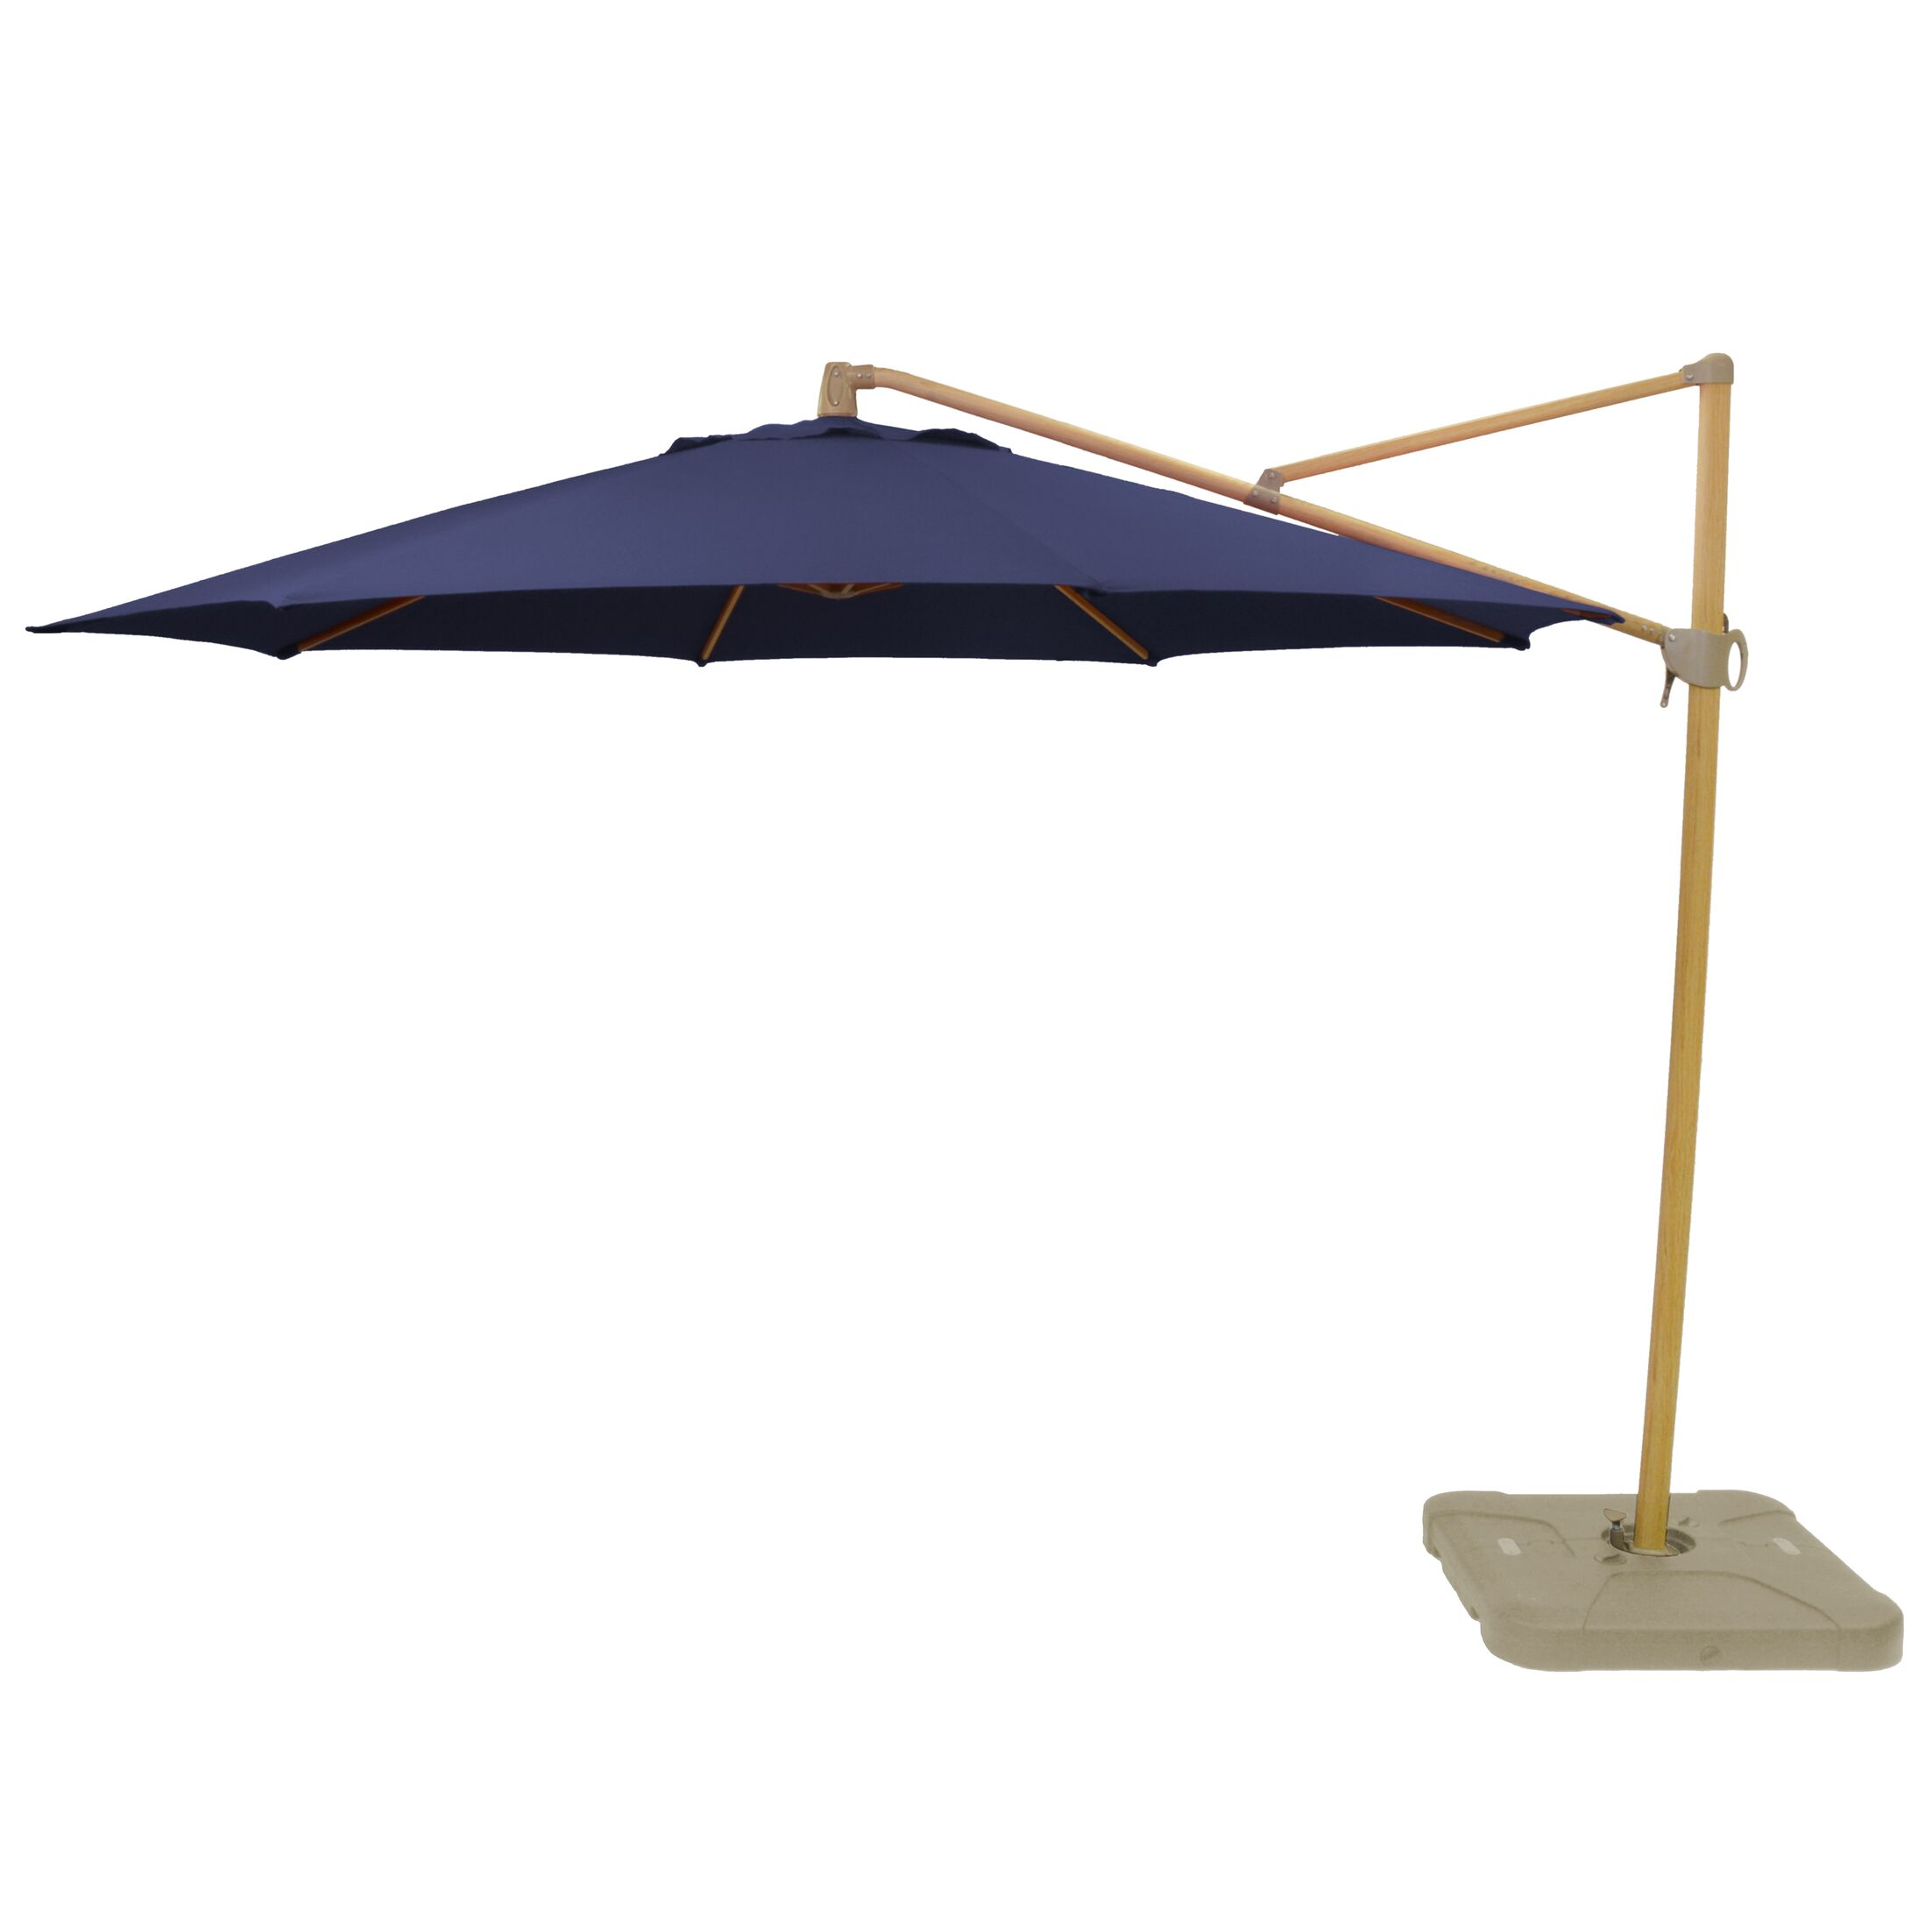 Kedzie Outdoor 11' Cantilever Umbrella Base Color: Gold, Fabric Color: Navy